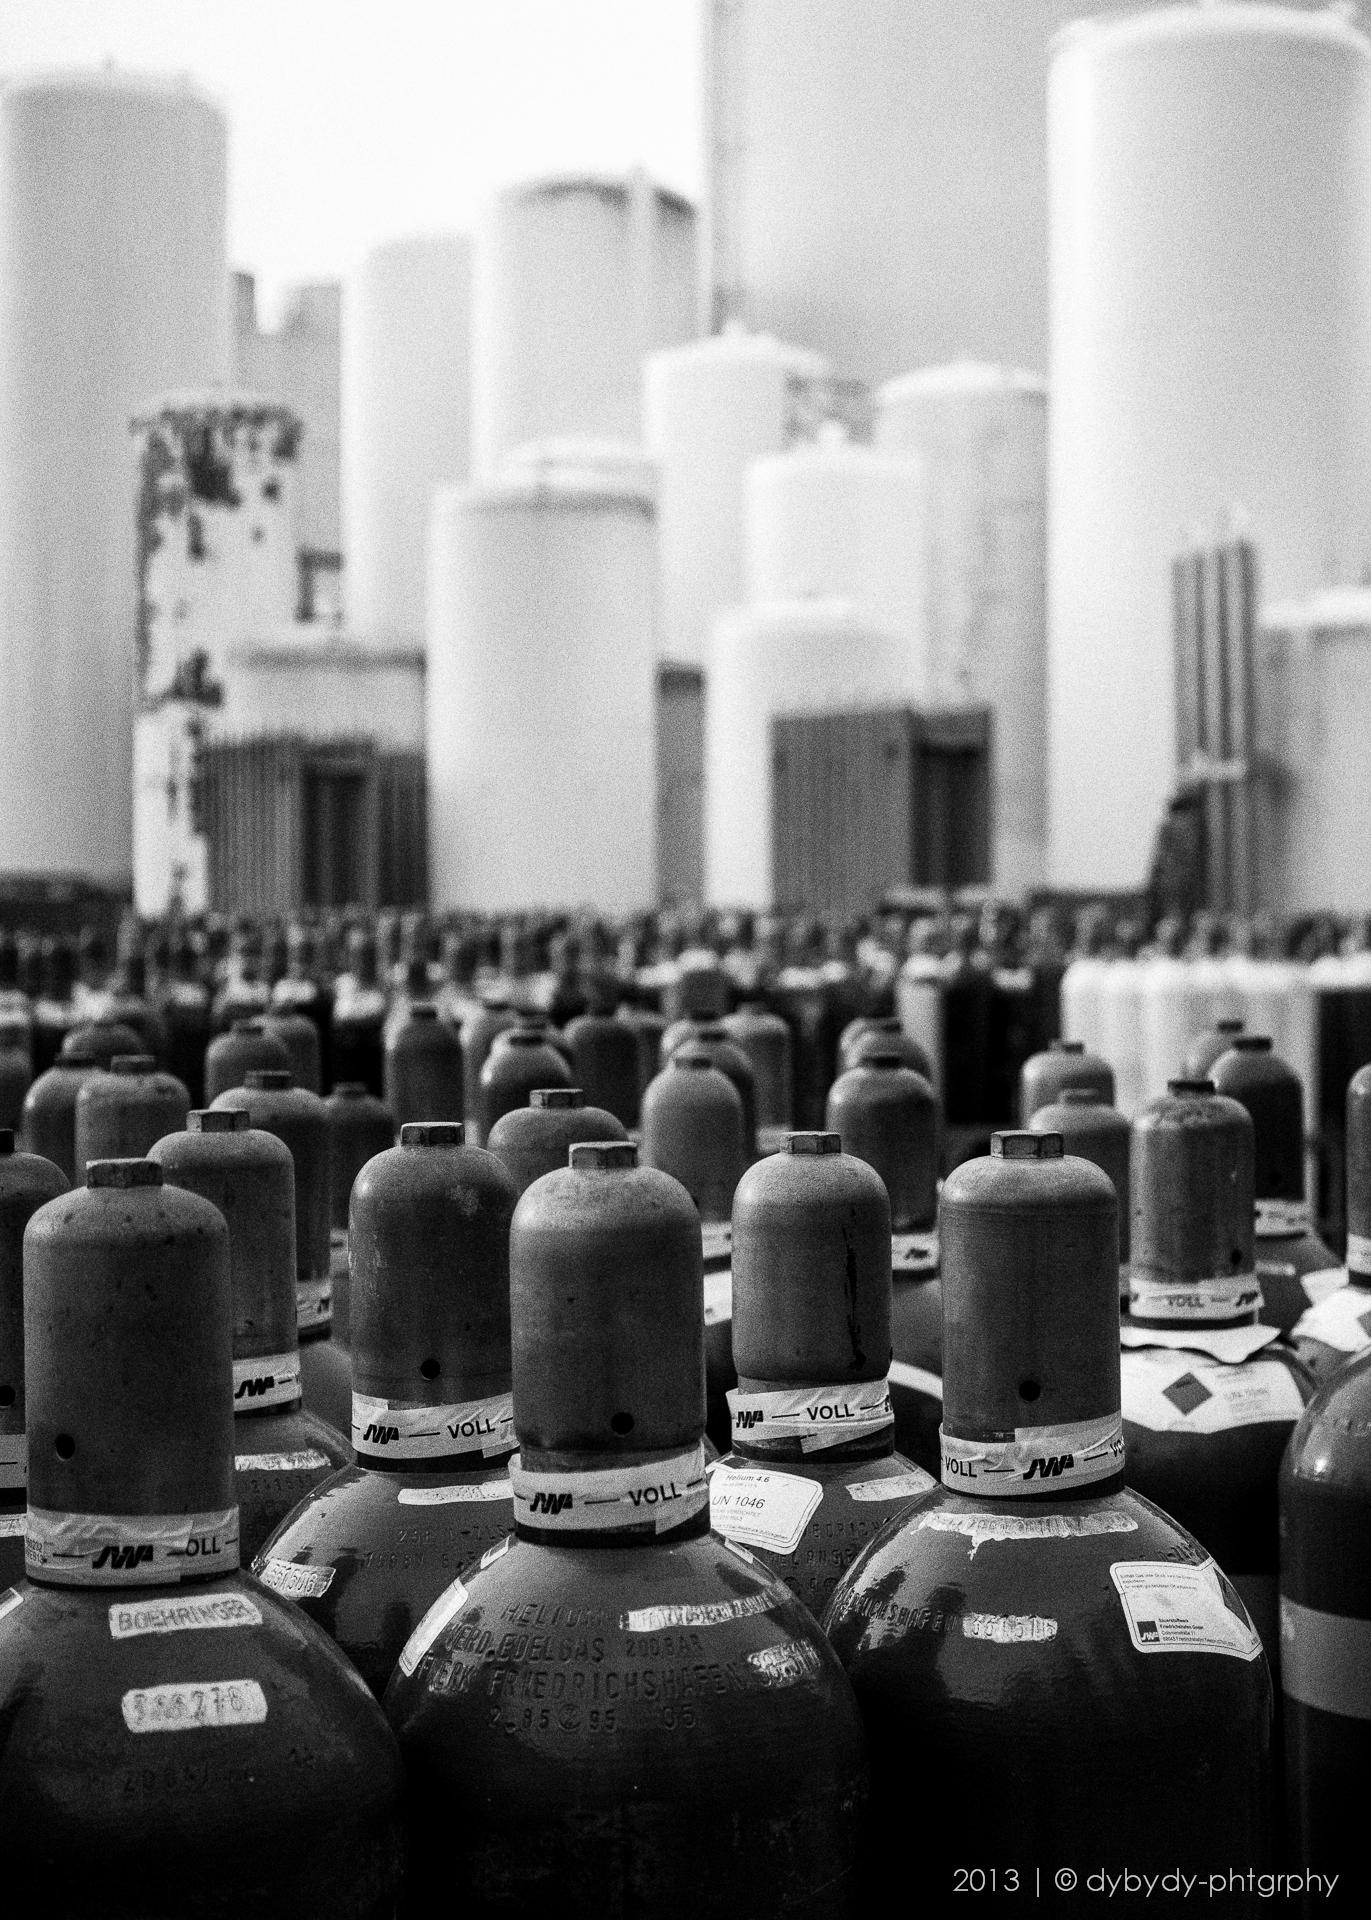 forest of bottles - sony nex 7 | sel35 f1.8 | f2.8 | ISO100 | 1/500